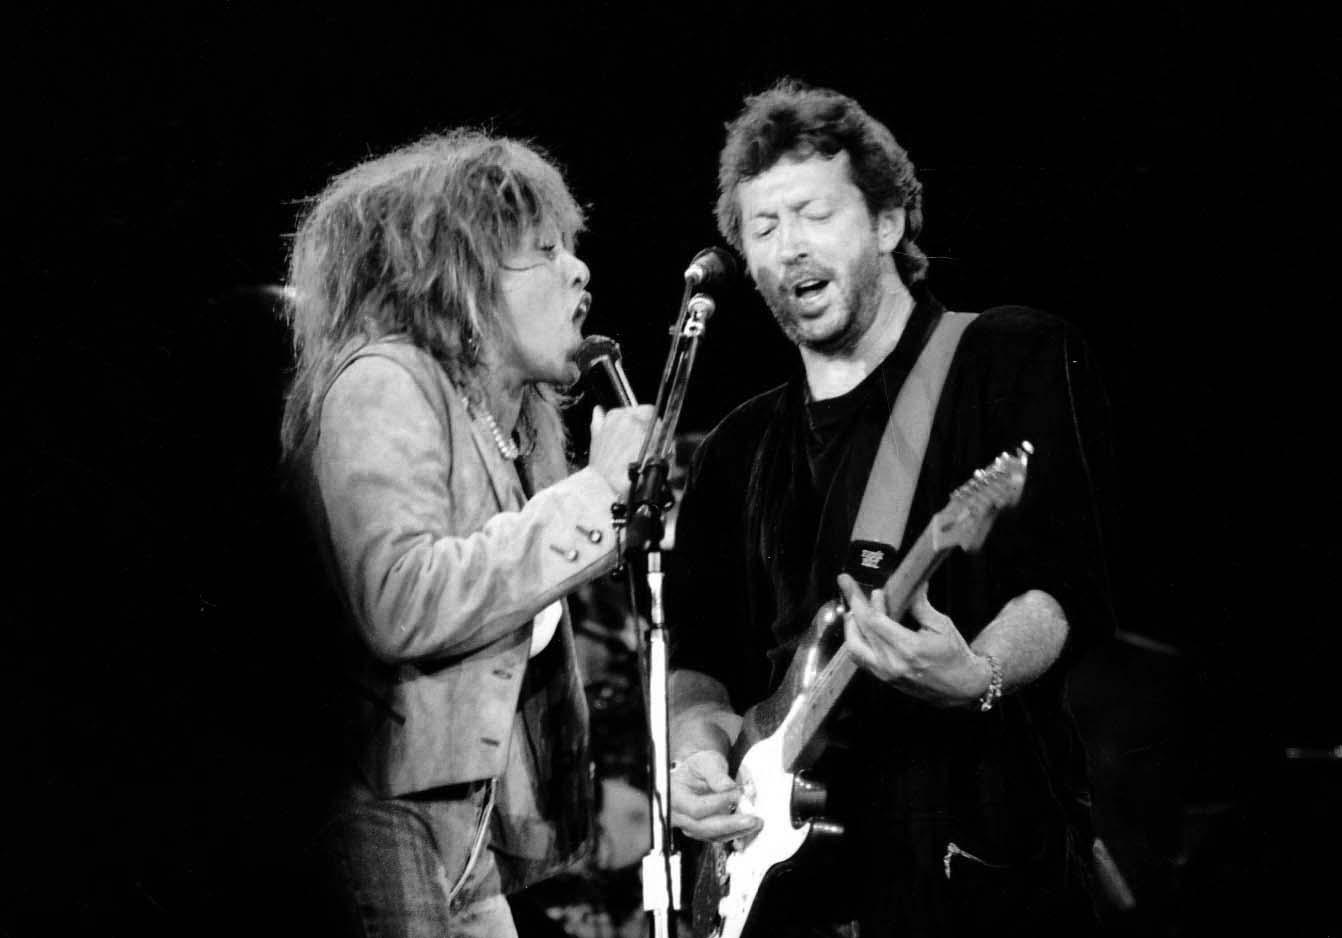 cantanti rock anni 70